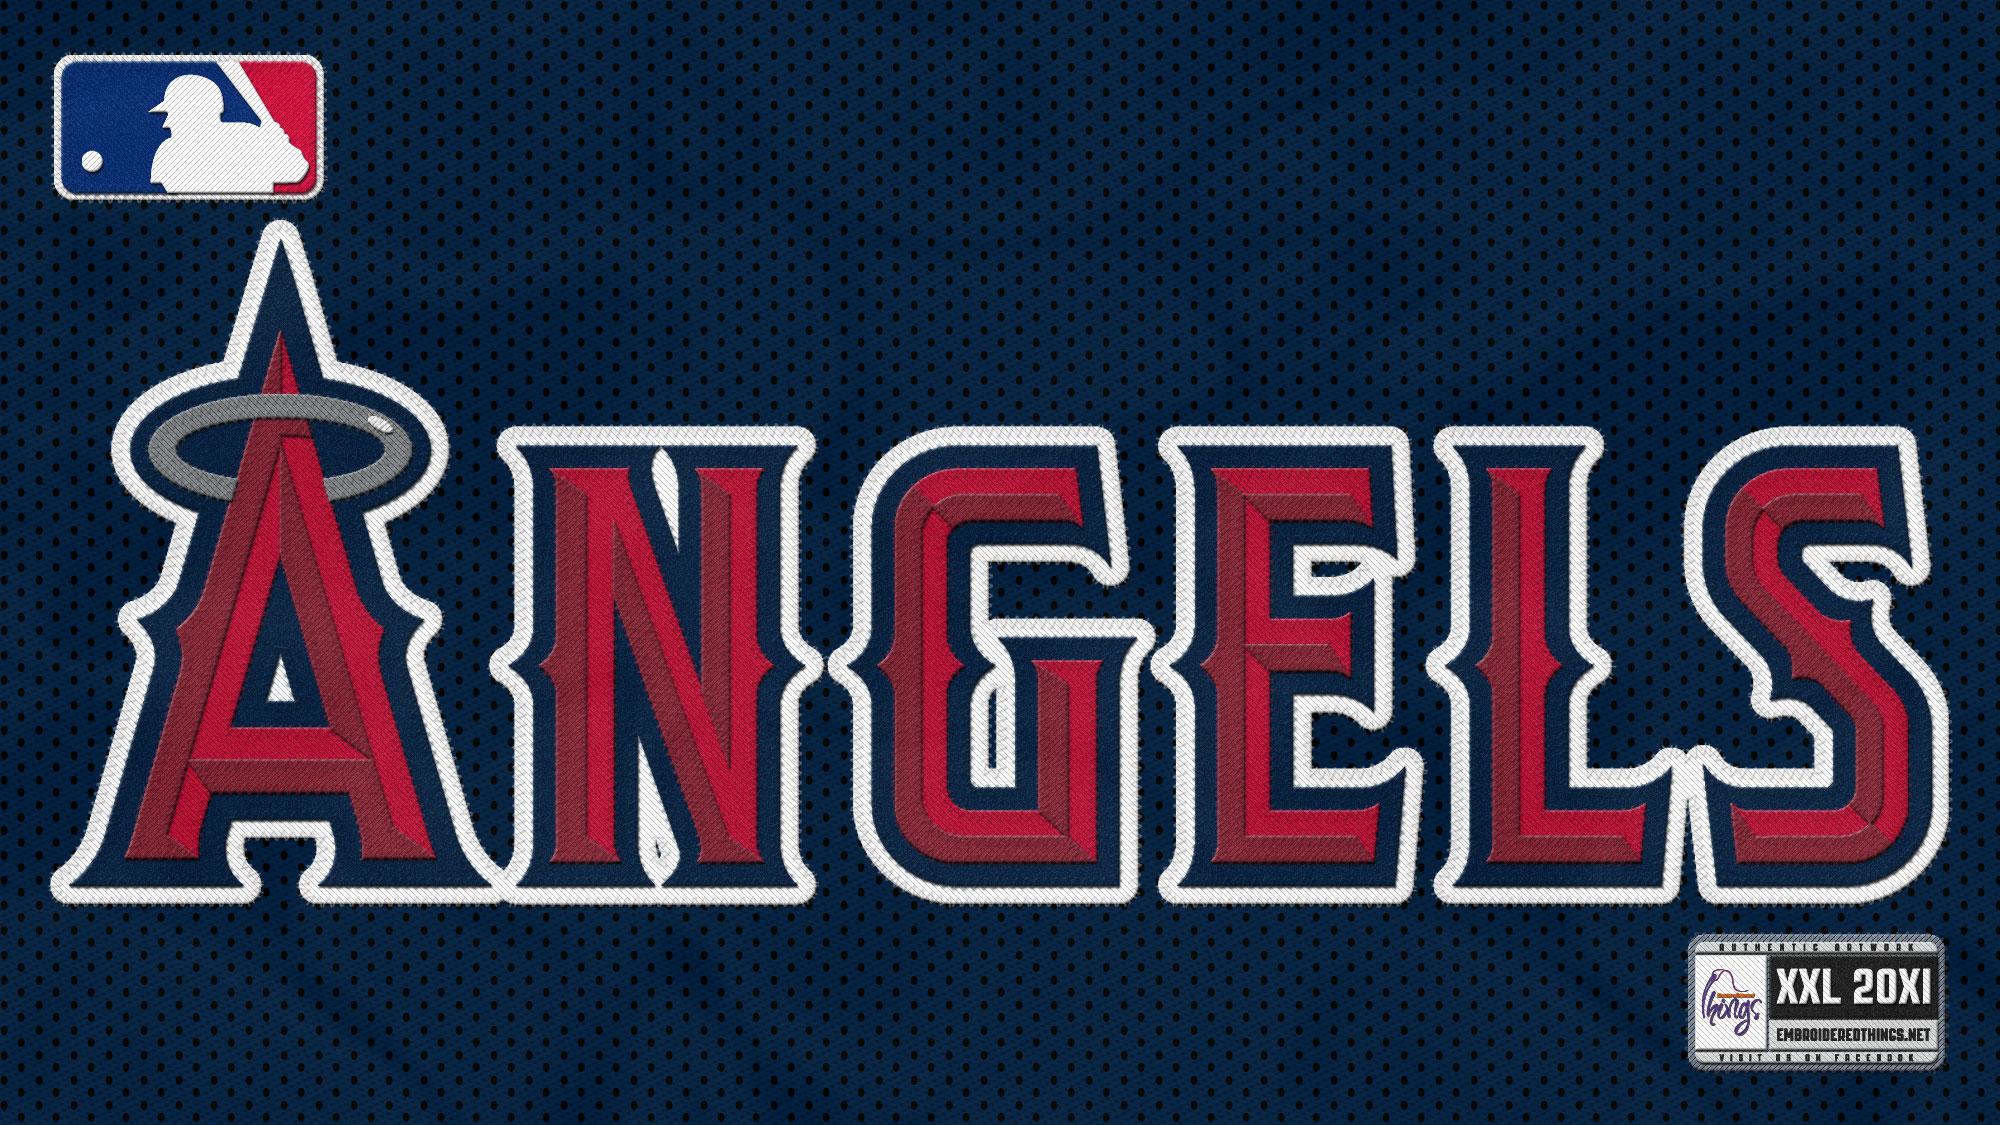 ANAHEIM ANGELS baseball mlb wh wallpaper 2000x1125 158482 2000x1125